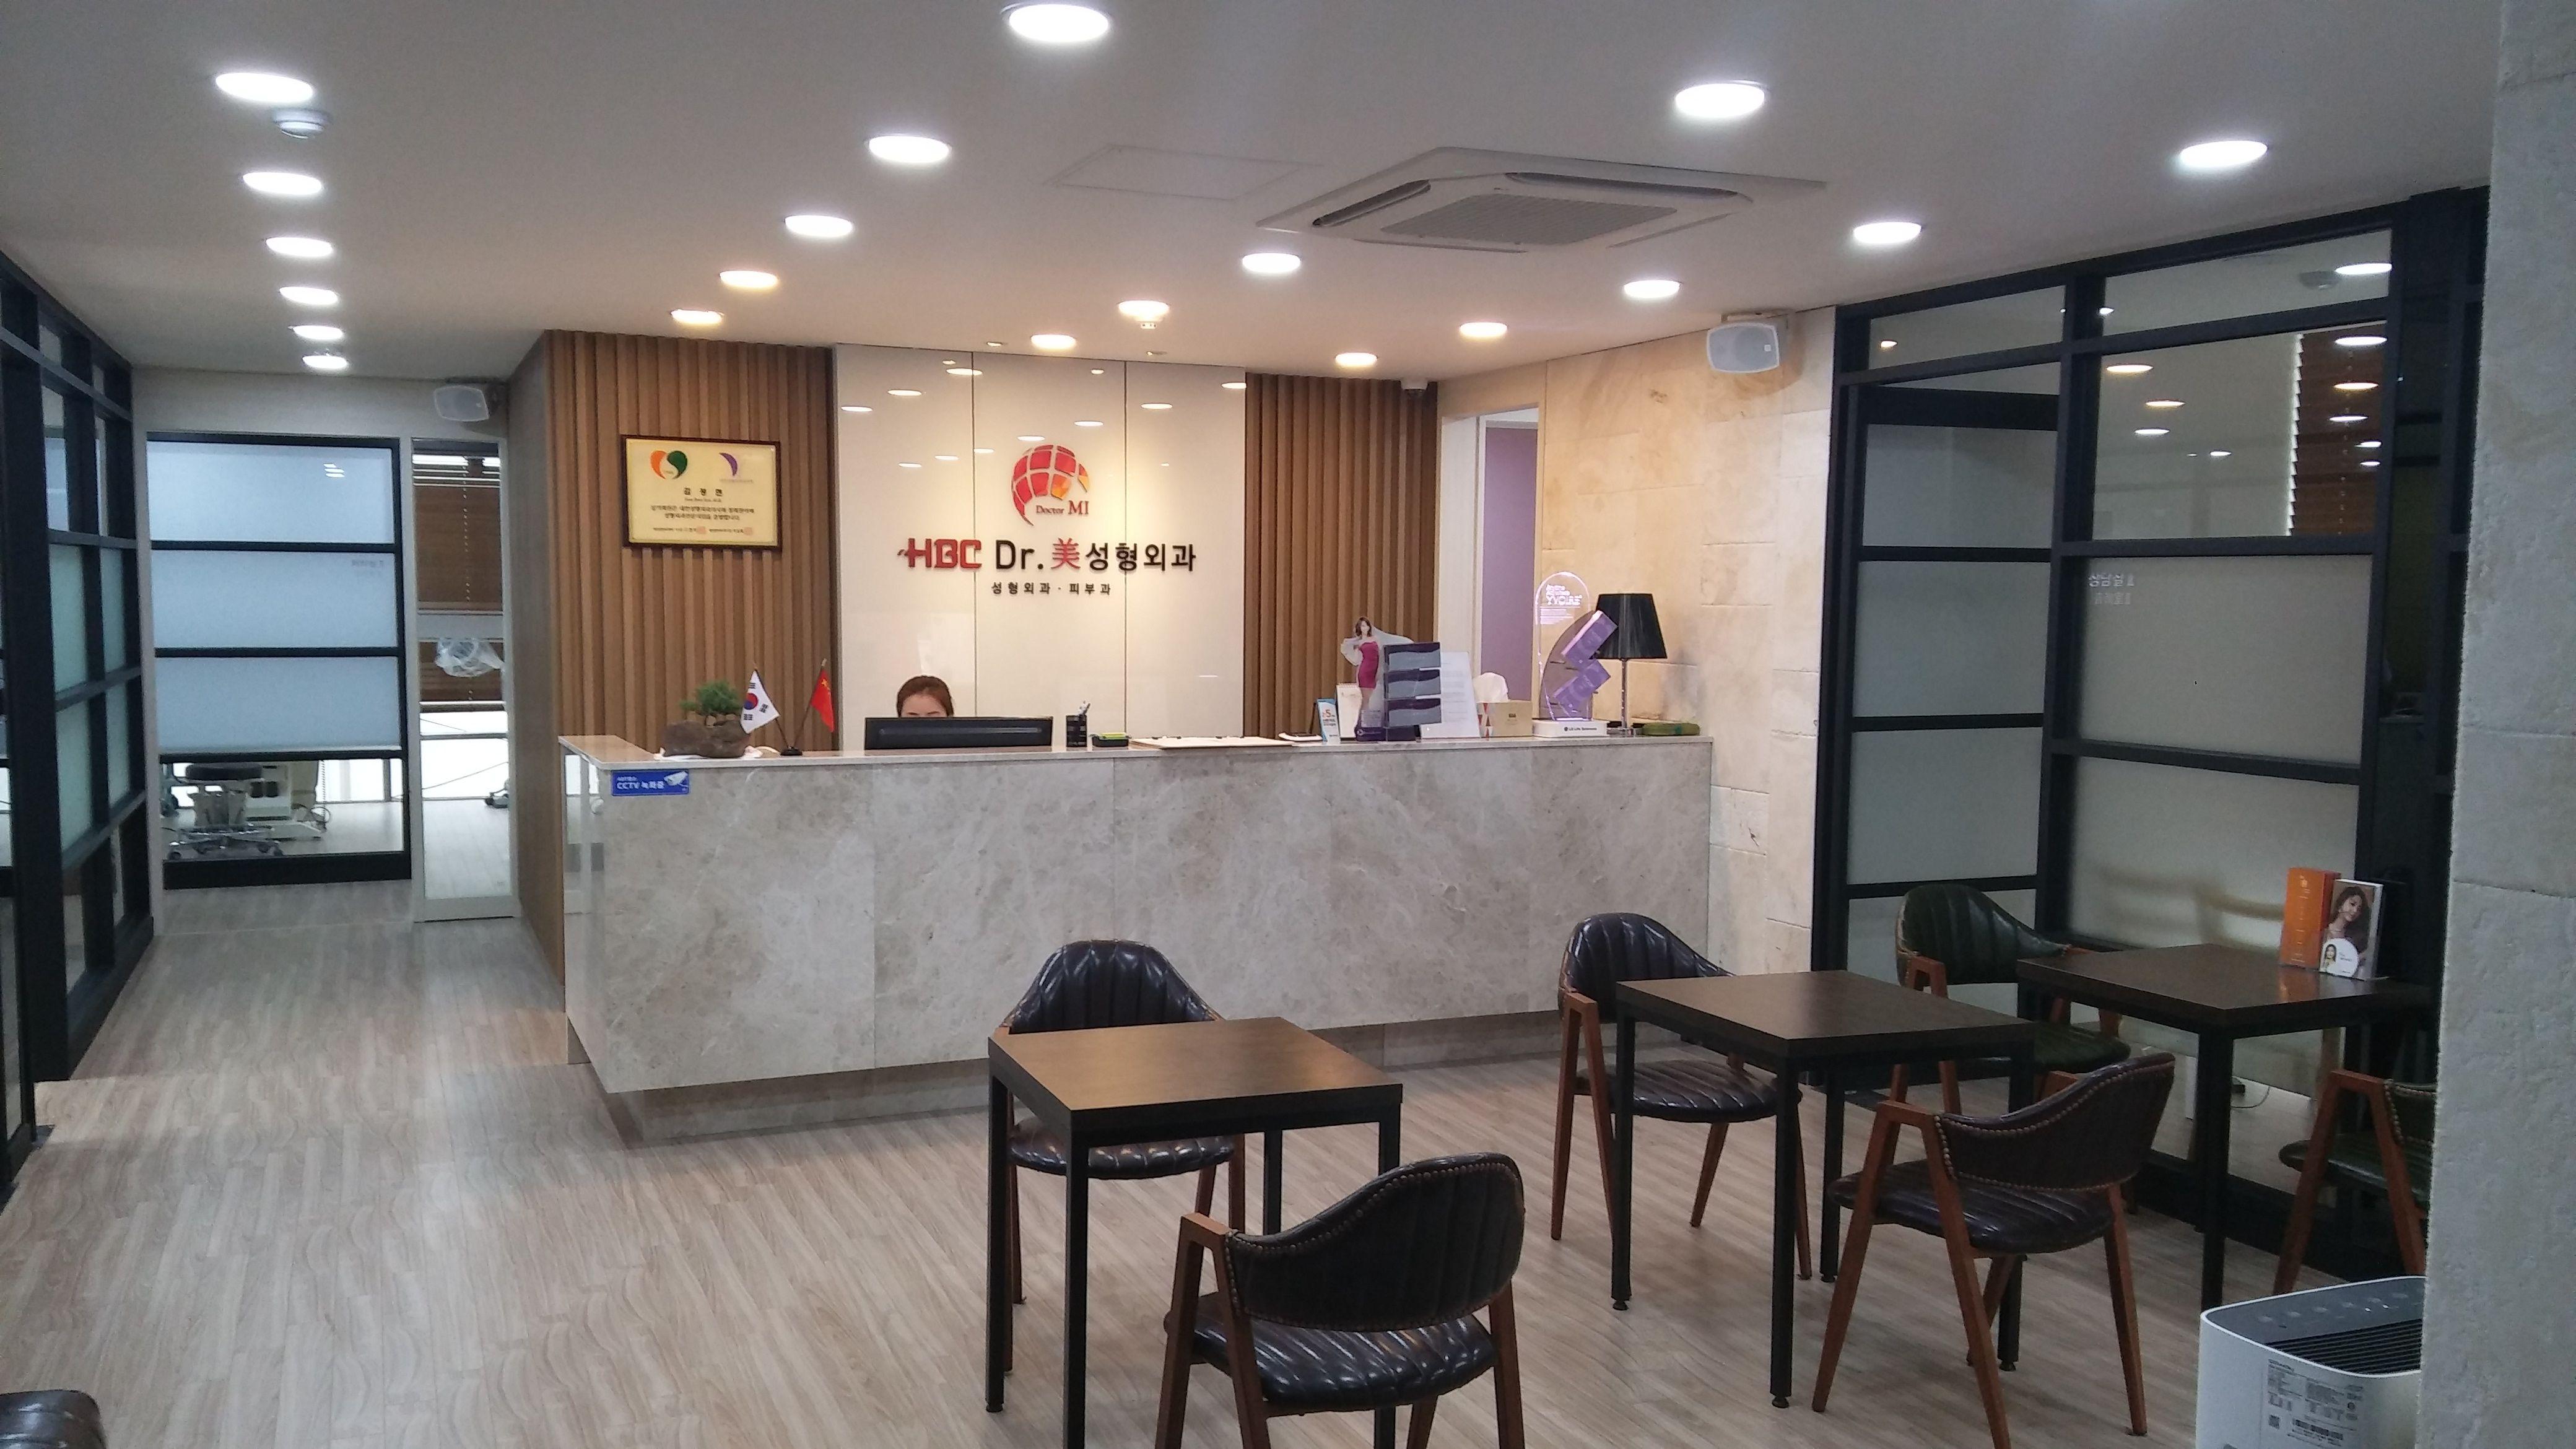 Dr.Mi Plastic Surgery Apgujeong